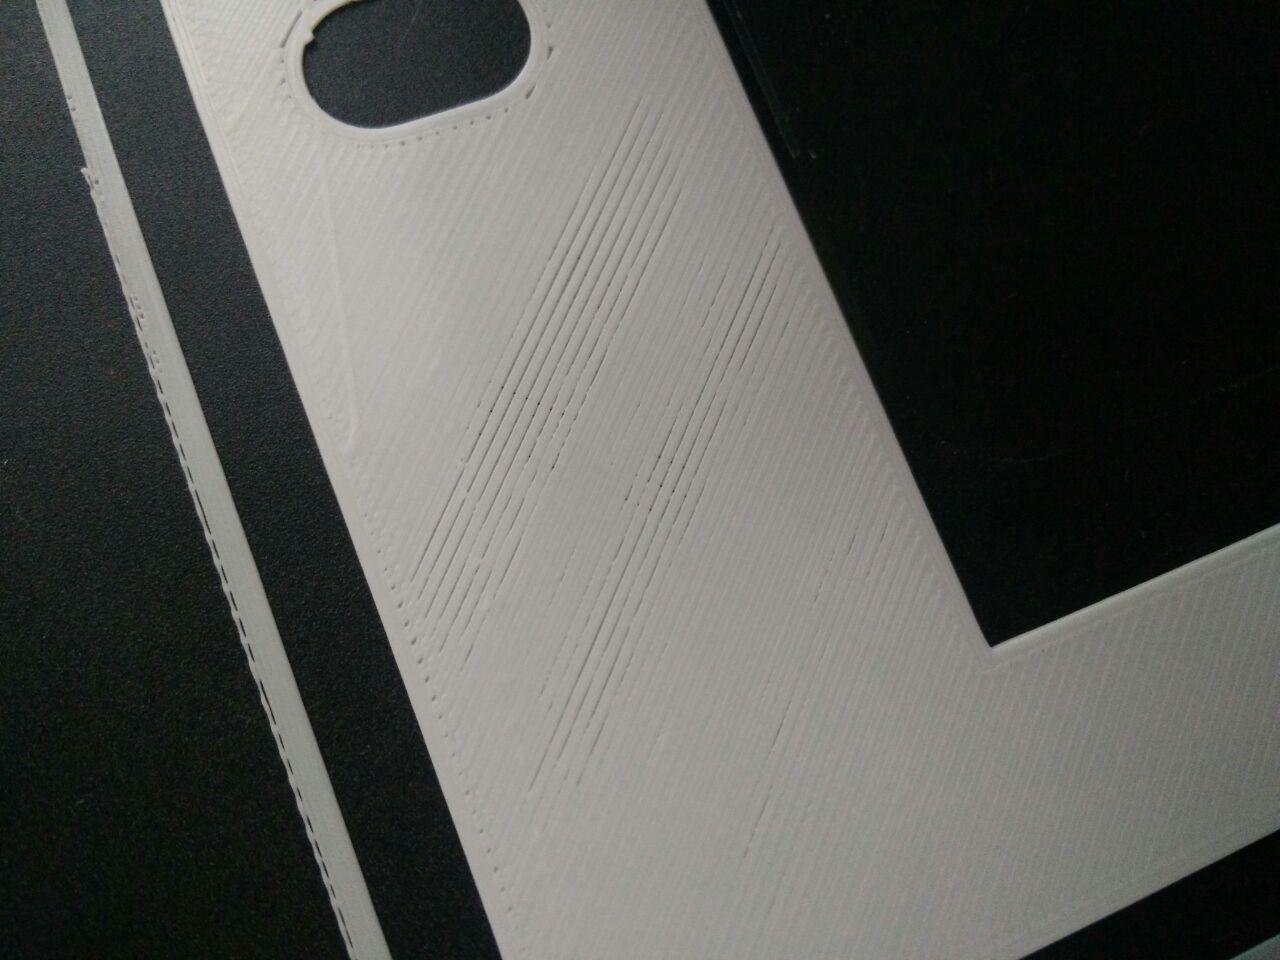 Marlin/extruder underextruding - 3D Printing / Software